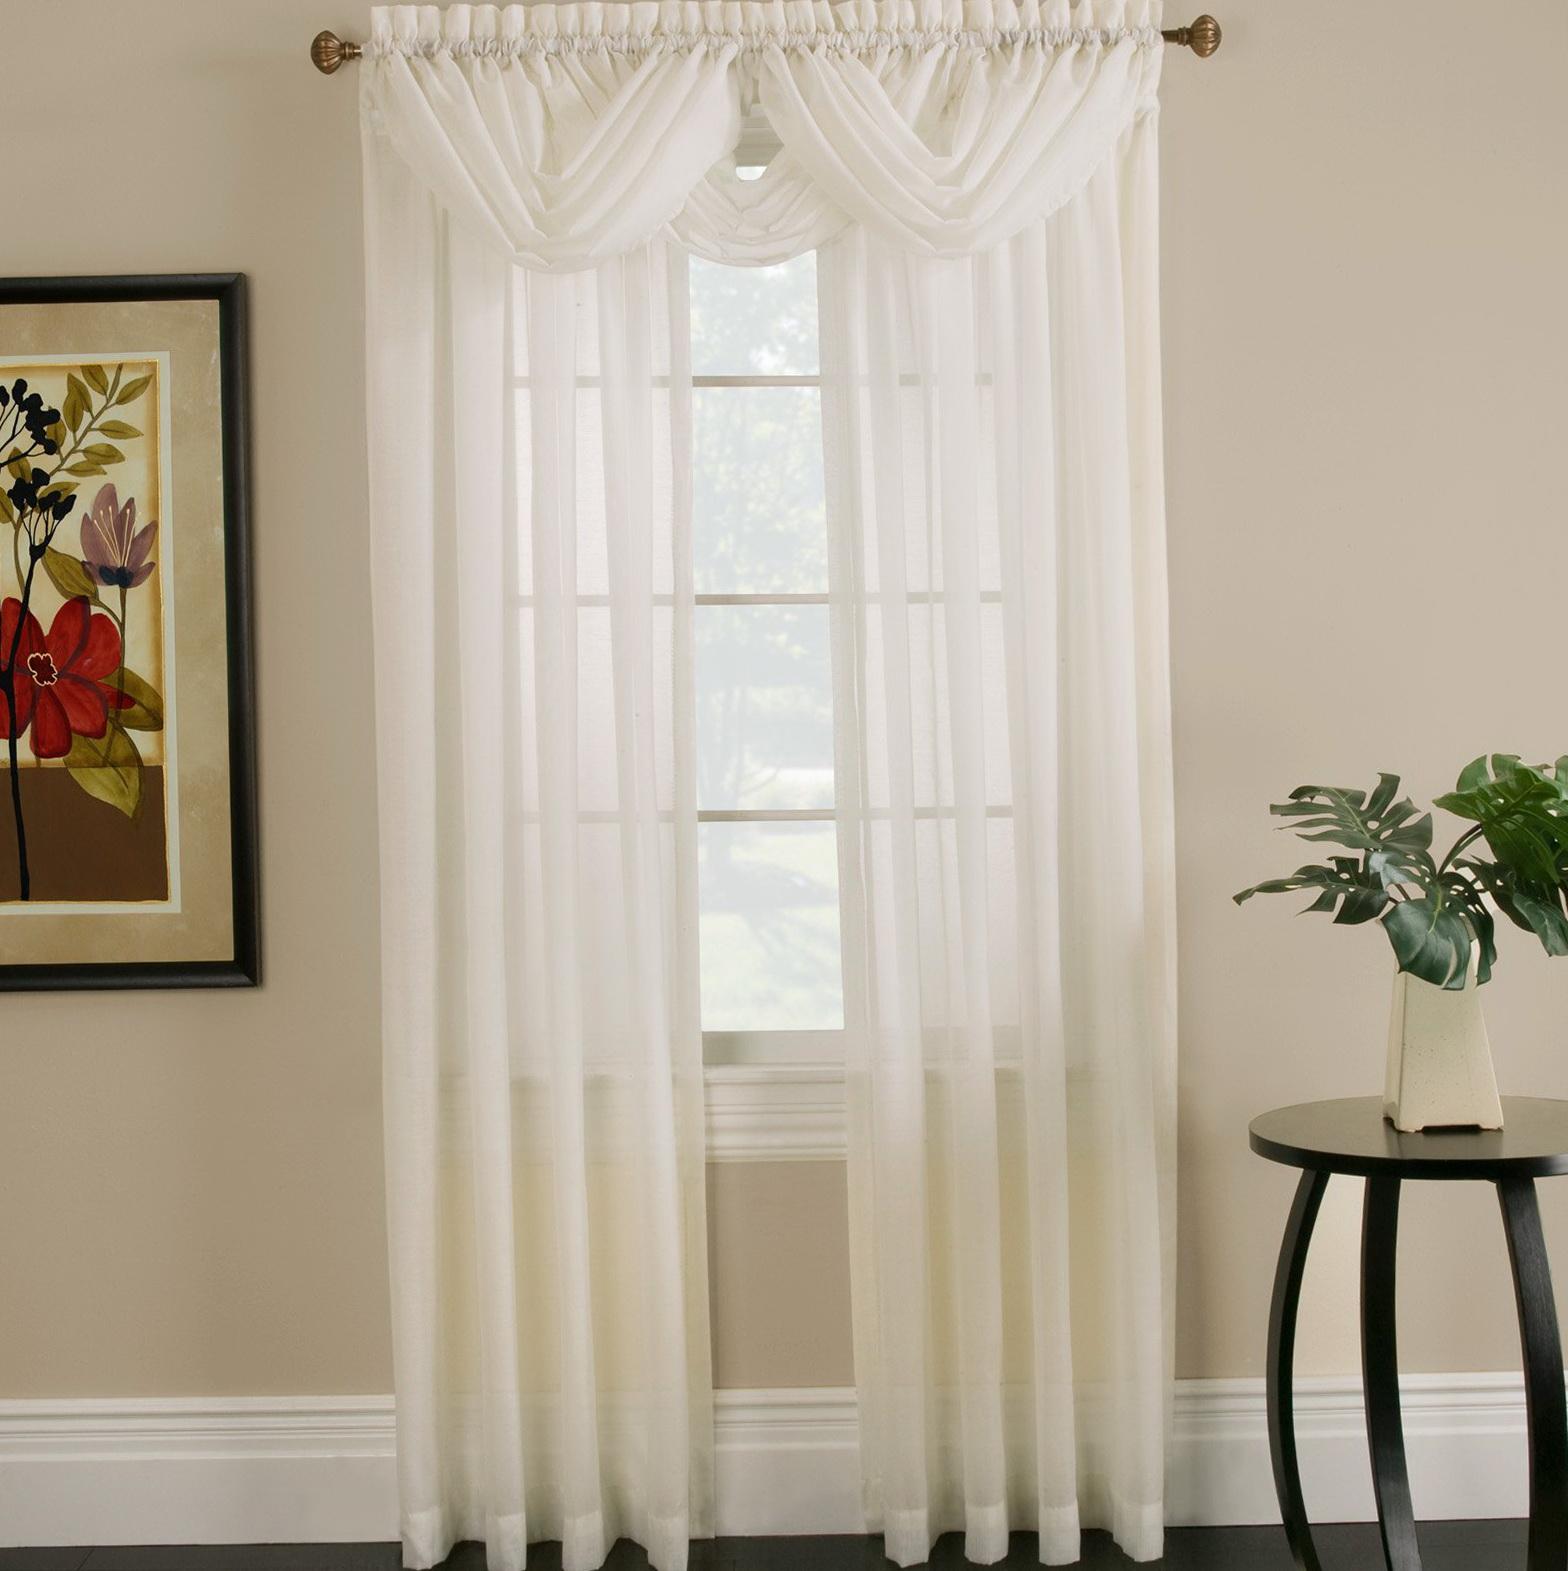 Flame Retardant Curtains For Classrooms Home Design Ideas